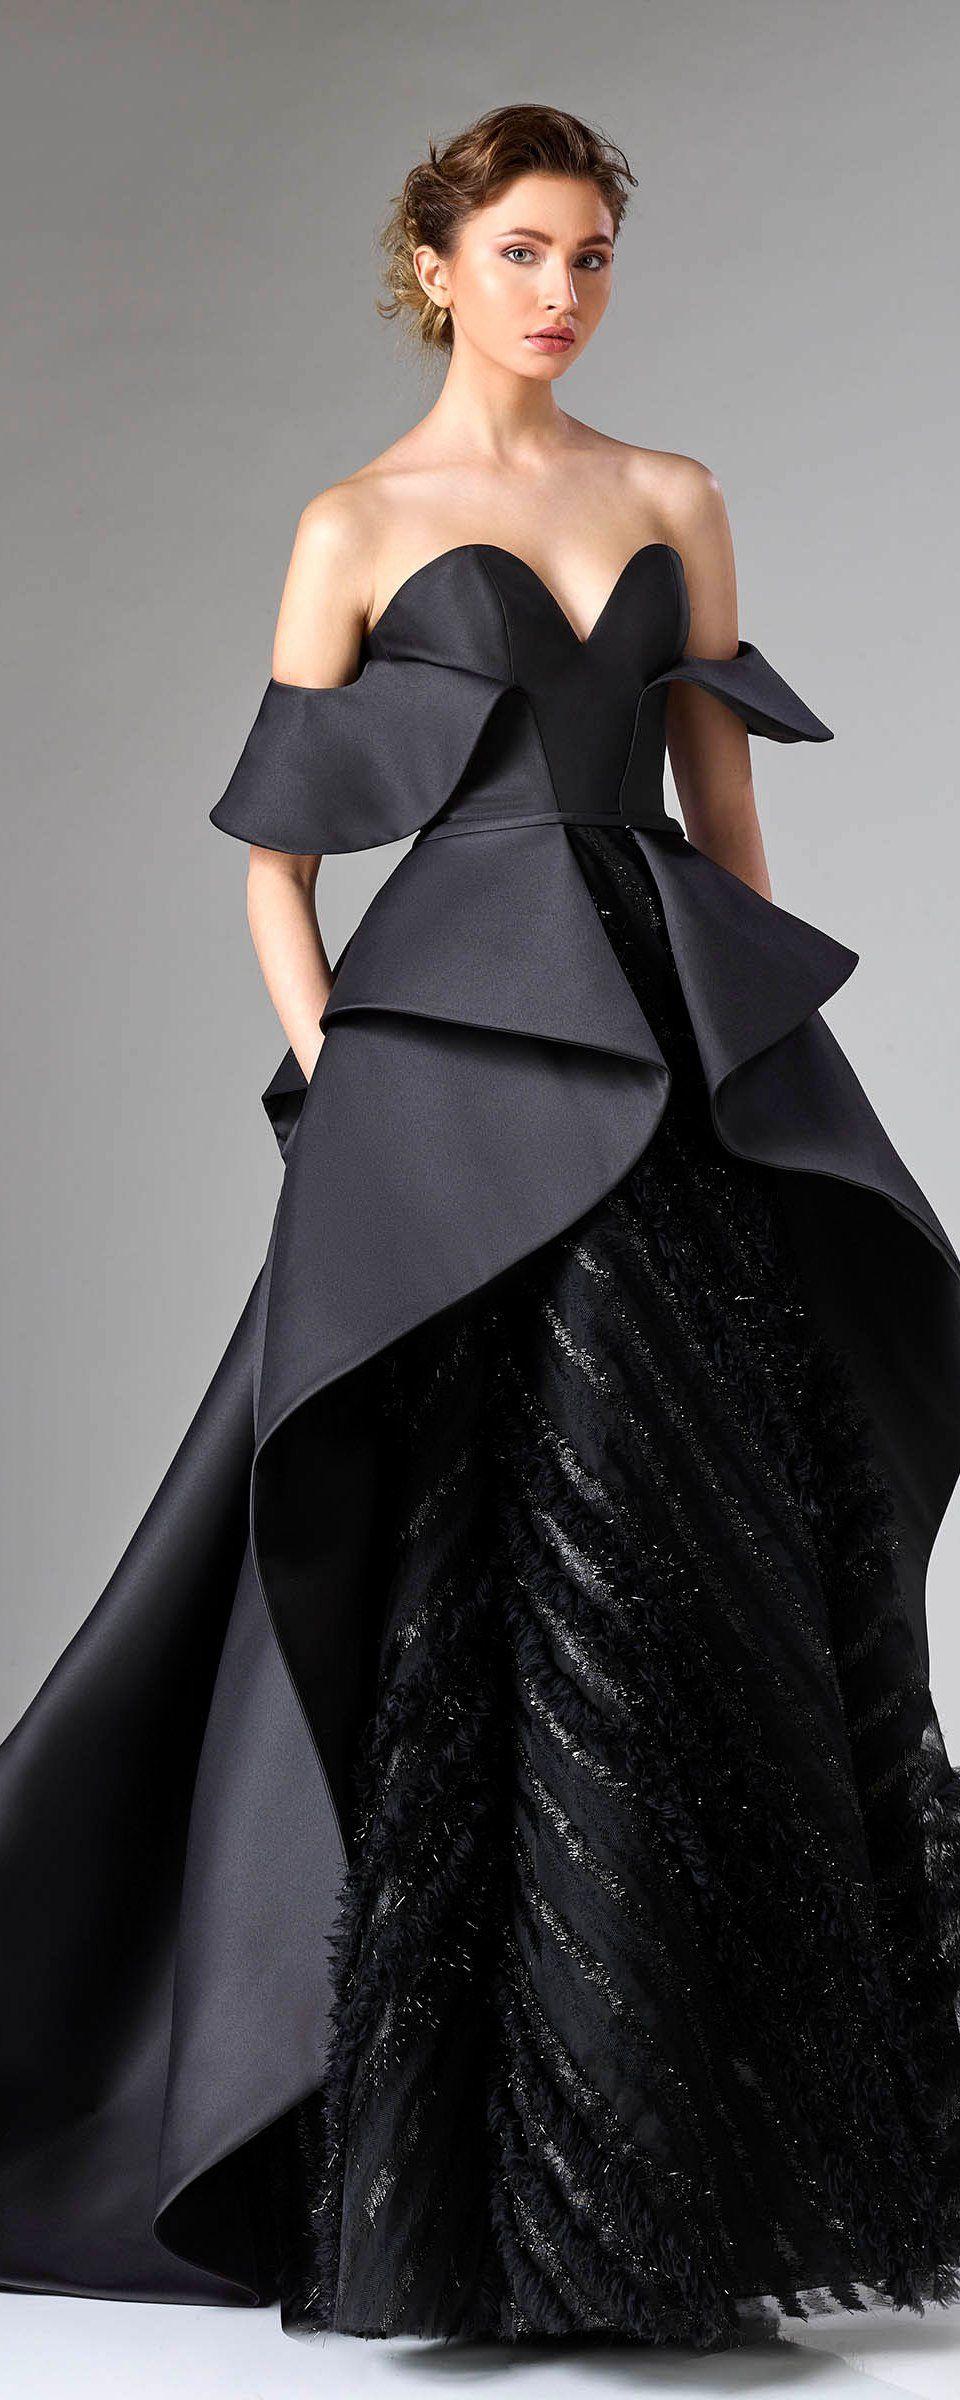 71cf4aa01c66 Edward Arsouni « Divina », A-H 2018-2019 - Haute couture | INSPO ...